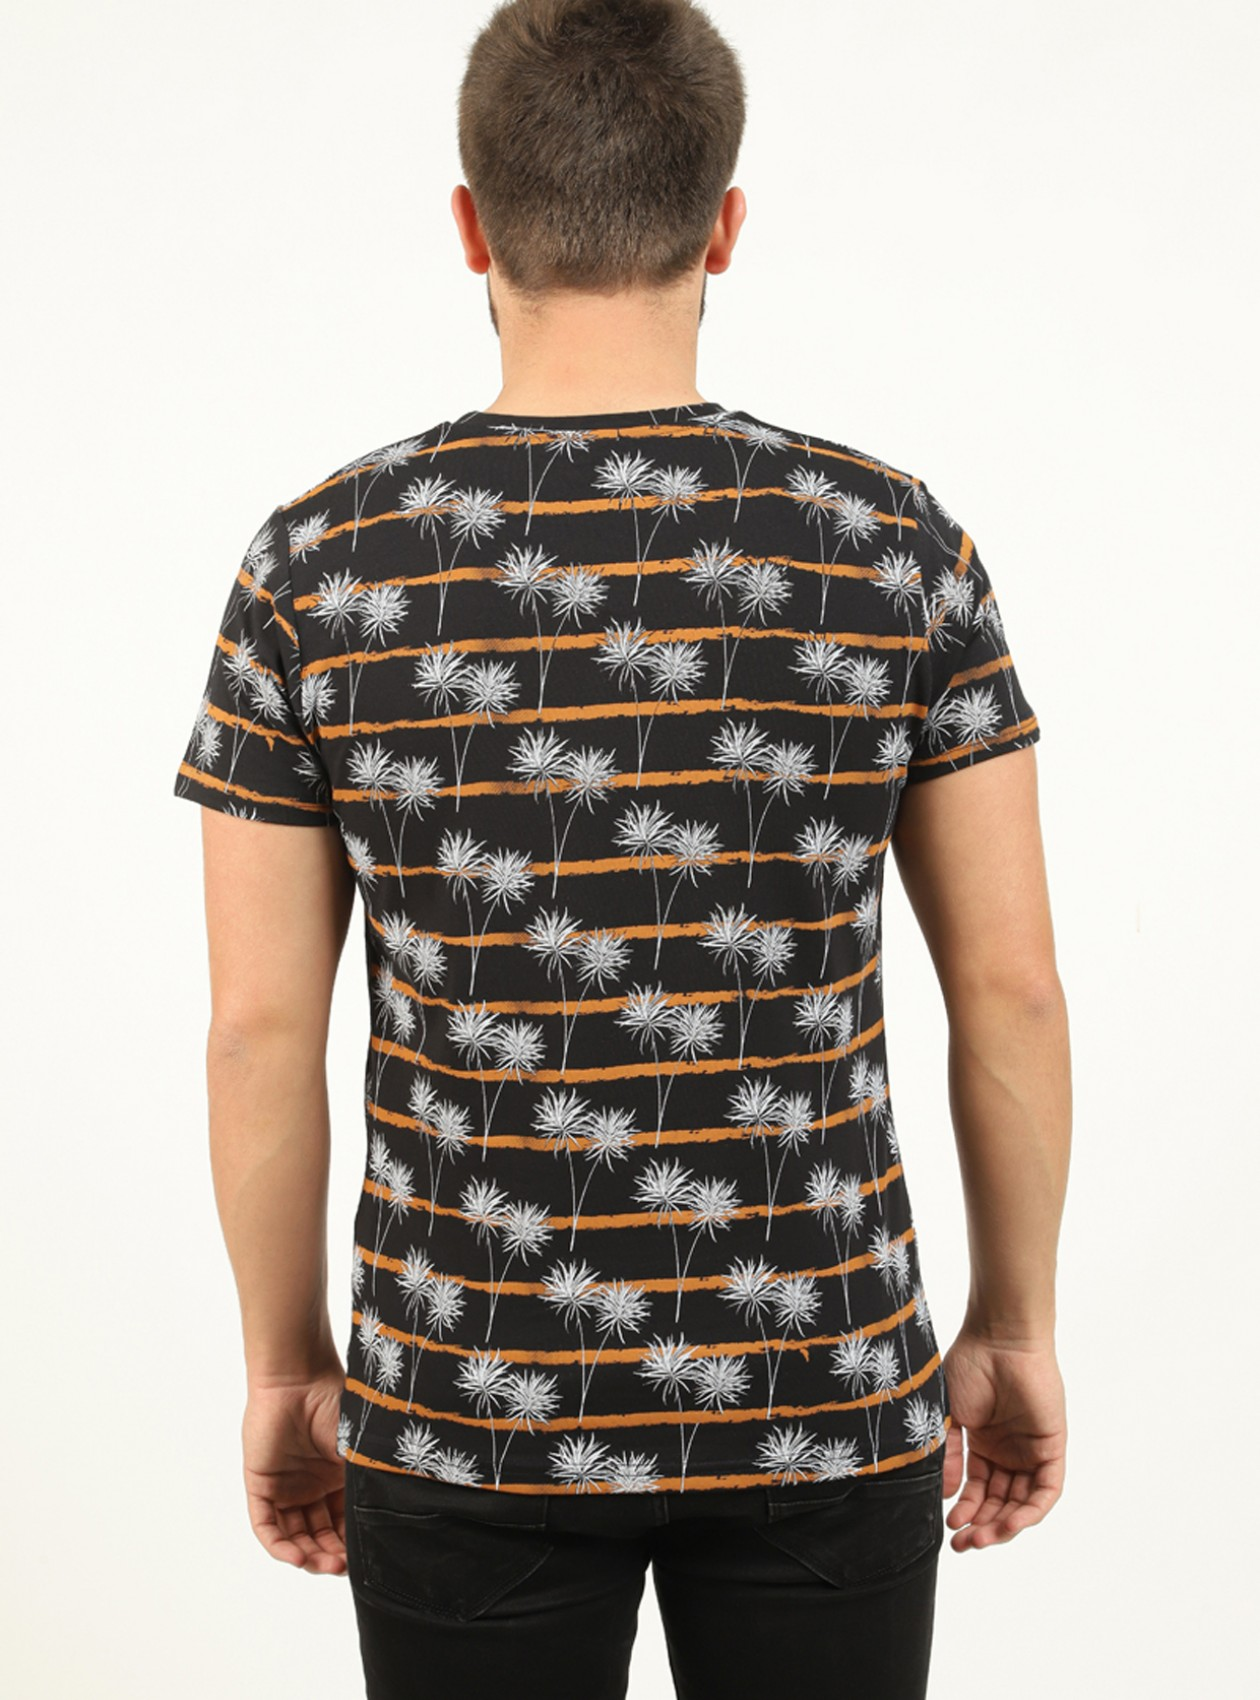 Tee-shirt homme noir avec poche poitrine